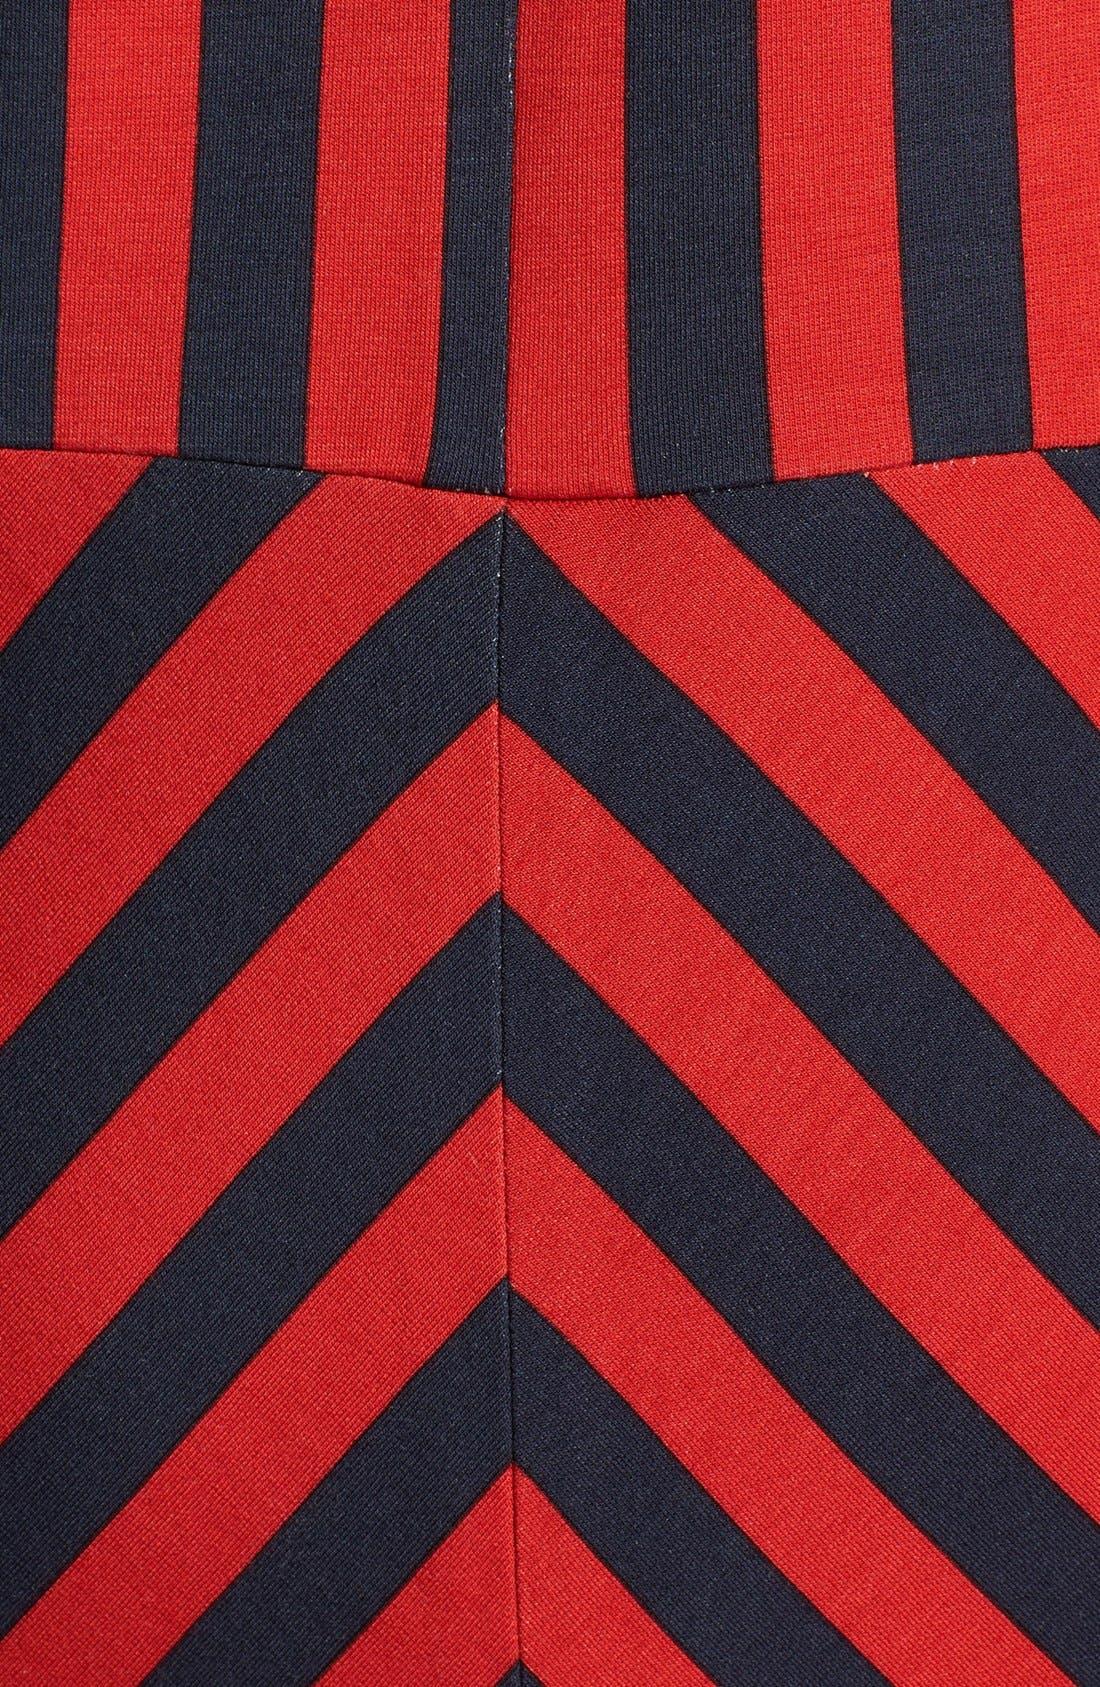 Alternate Image 4  - GRID PRINT SWEATER DRESS